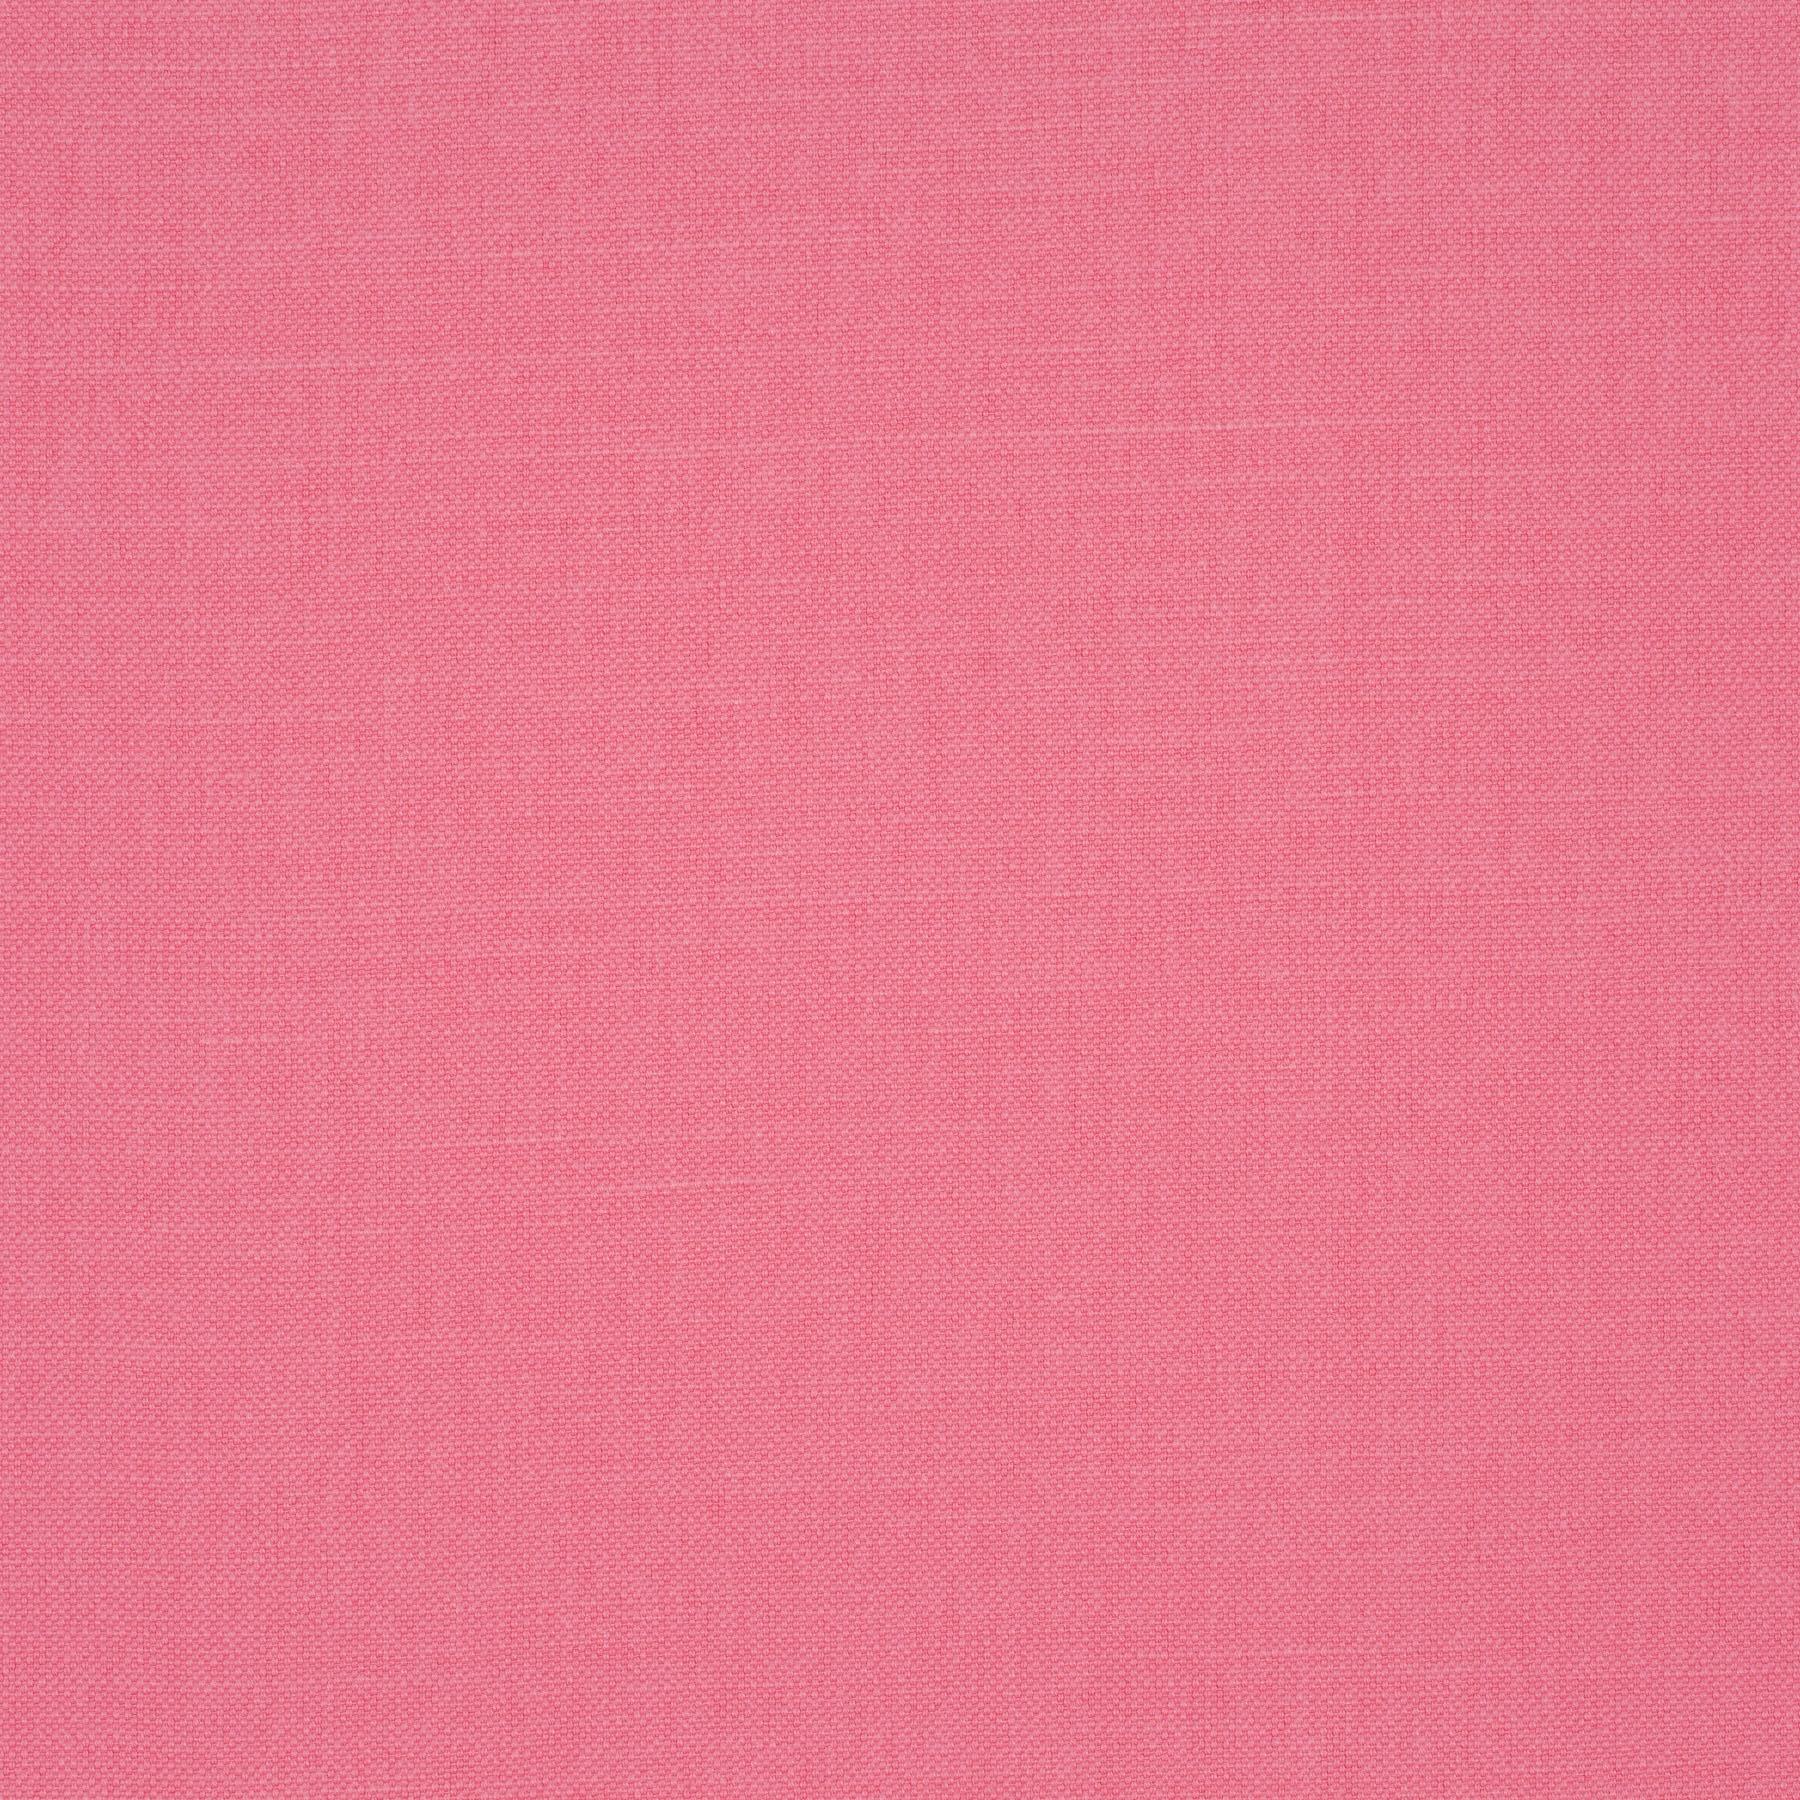 pink hot madison-0